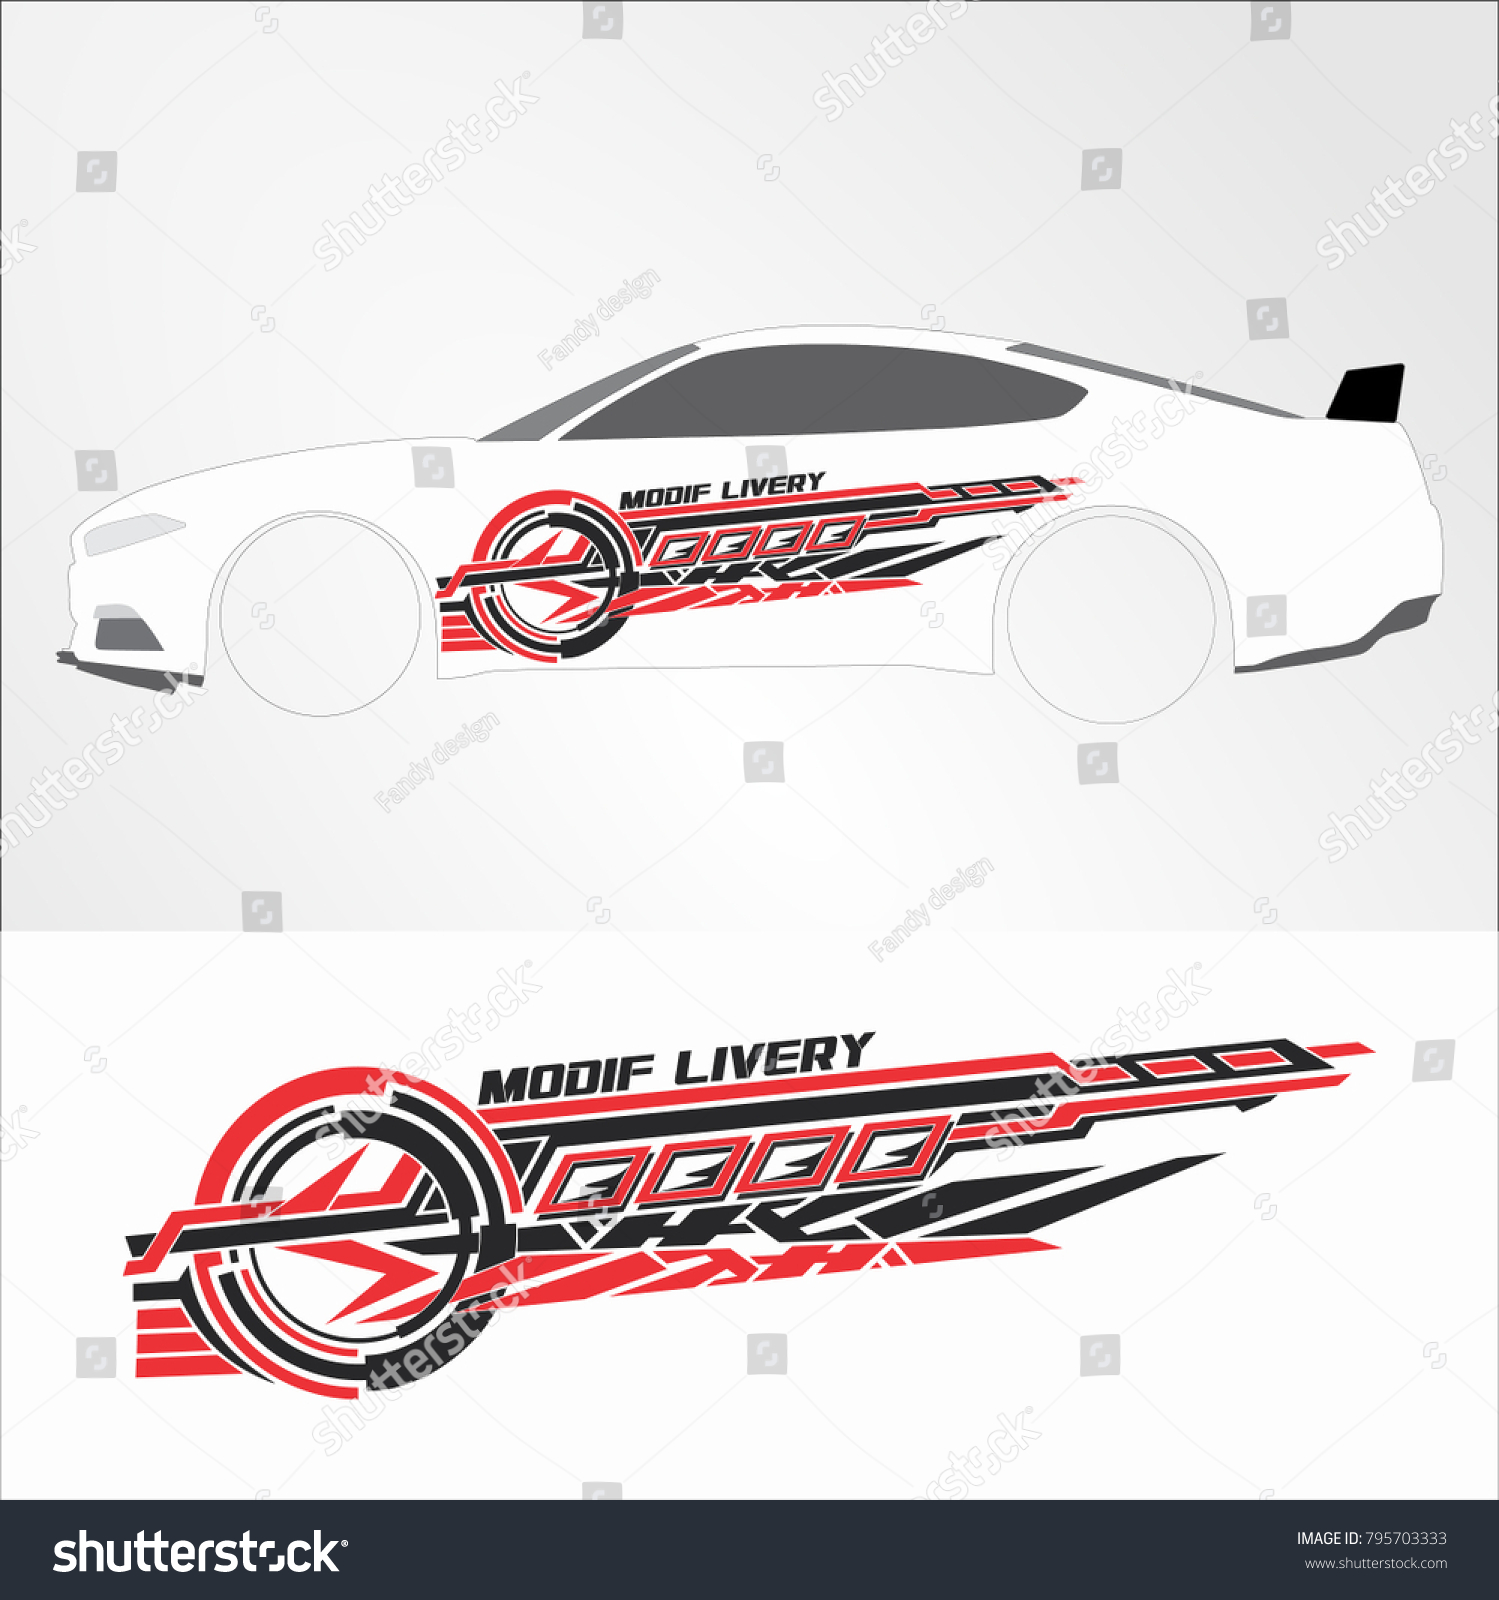 Vinyls Decals For Car Modif Sticker Motorcycle Racing Vehicle